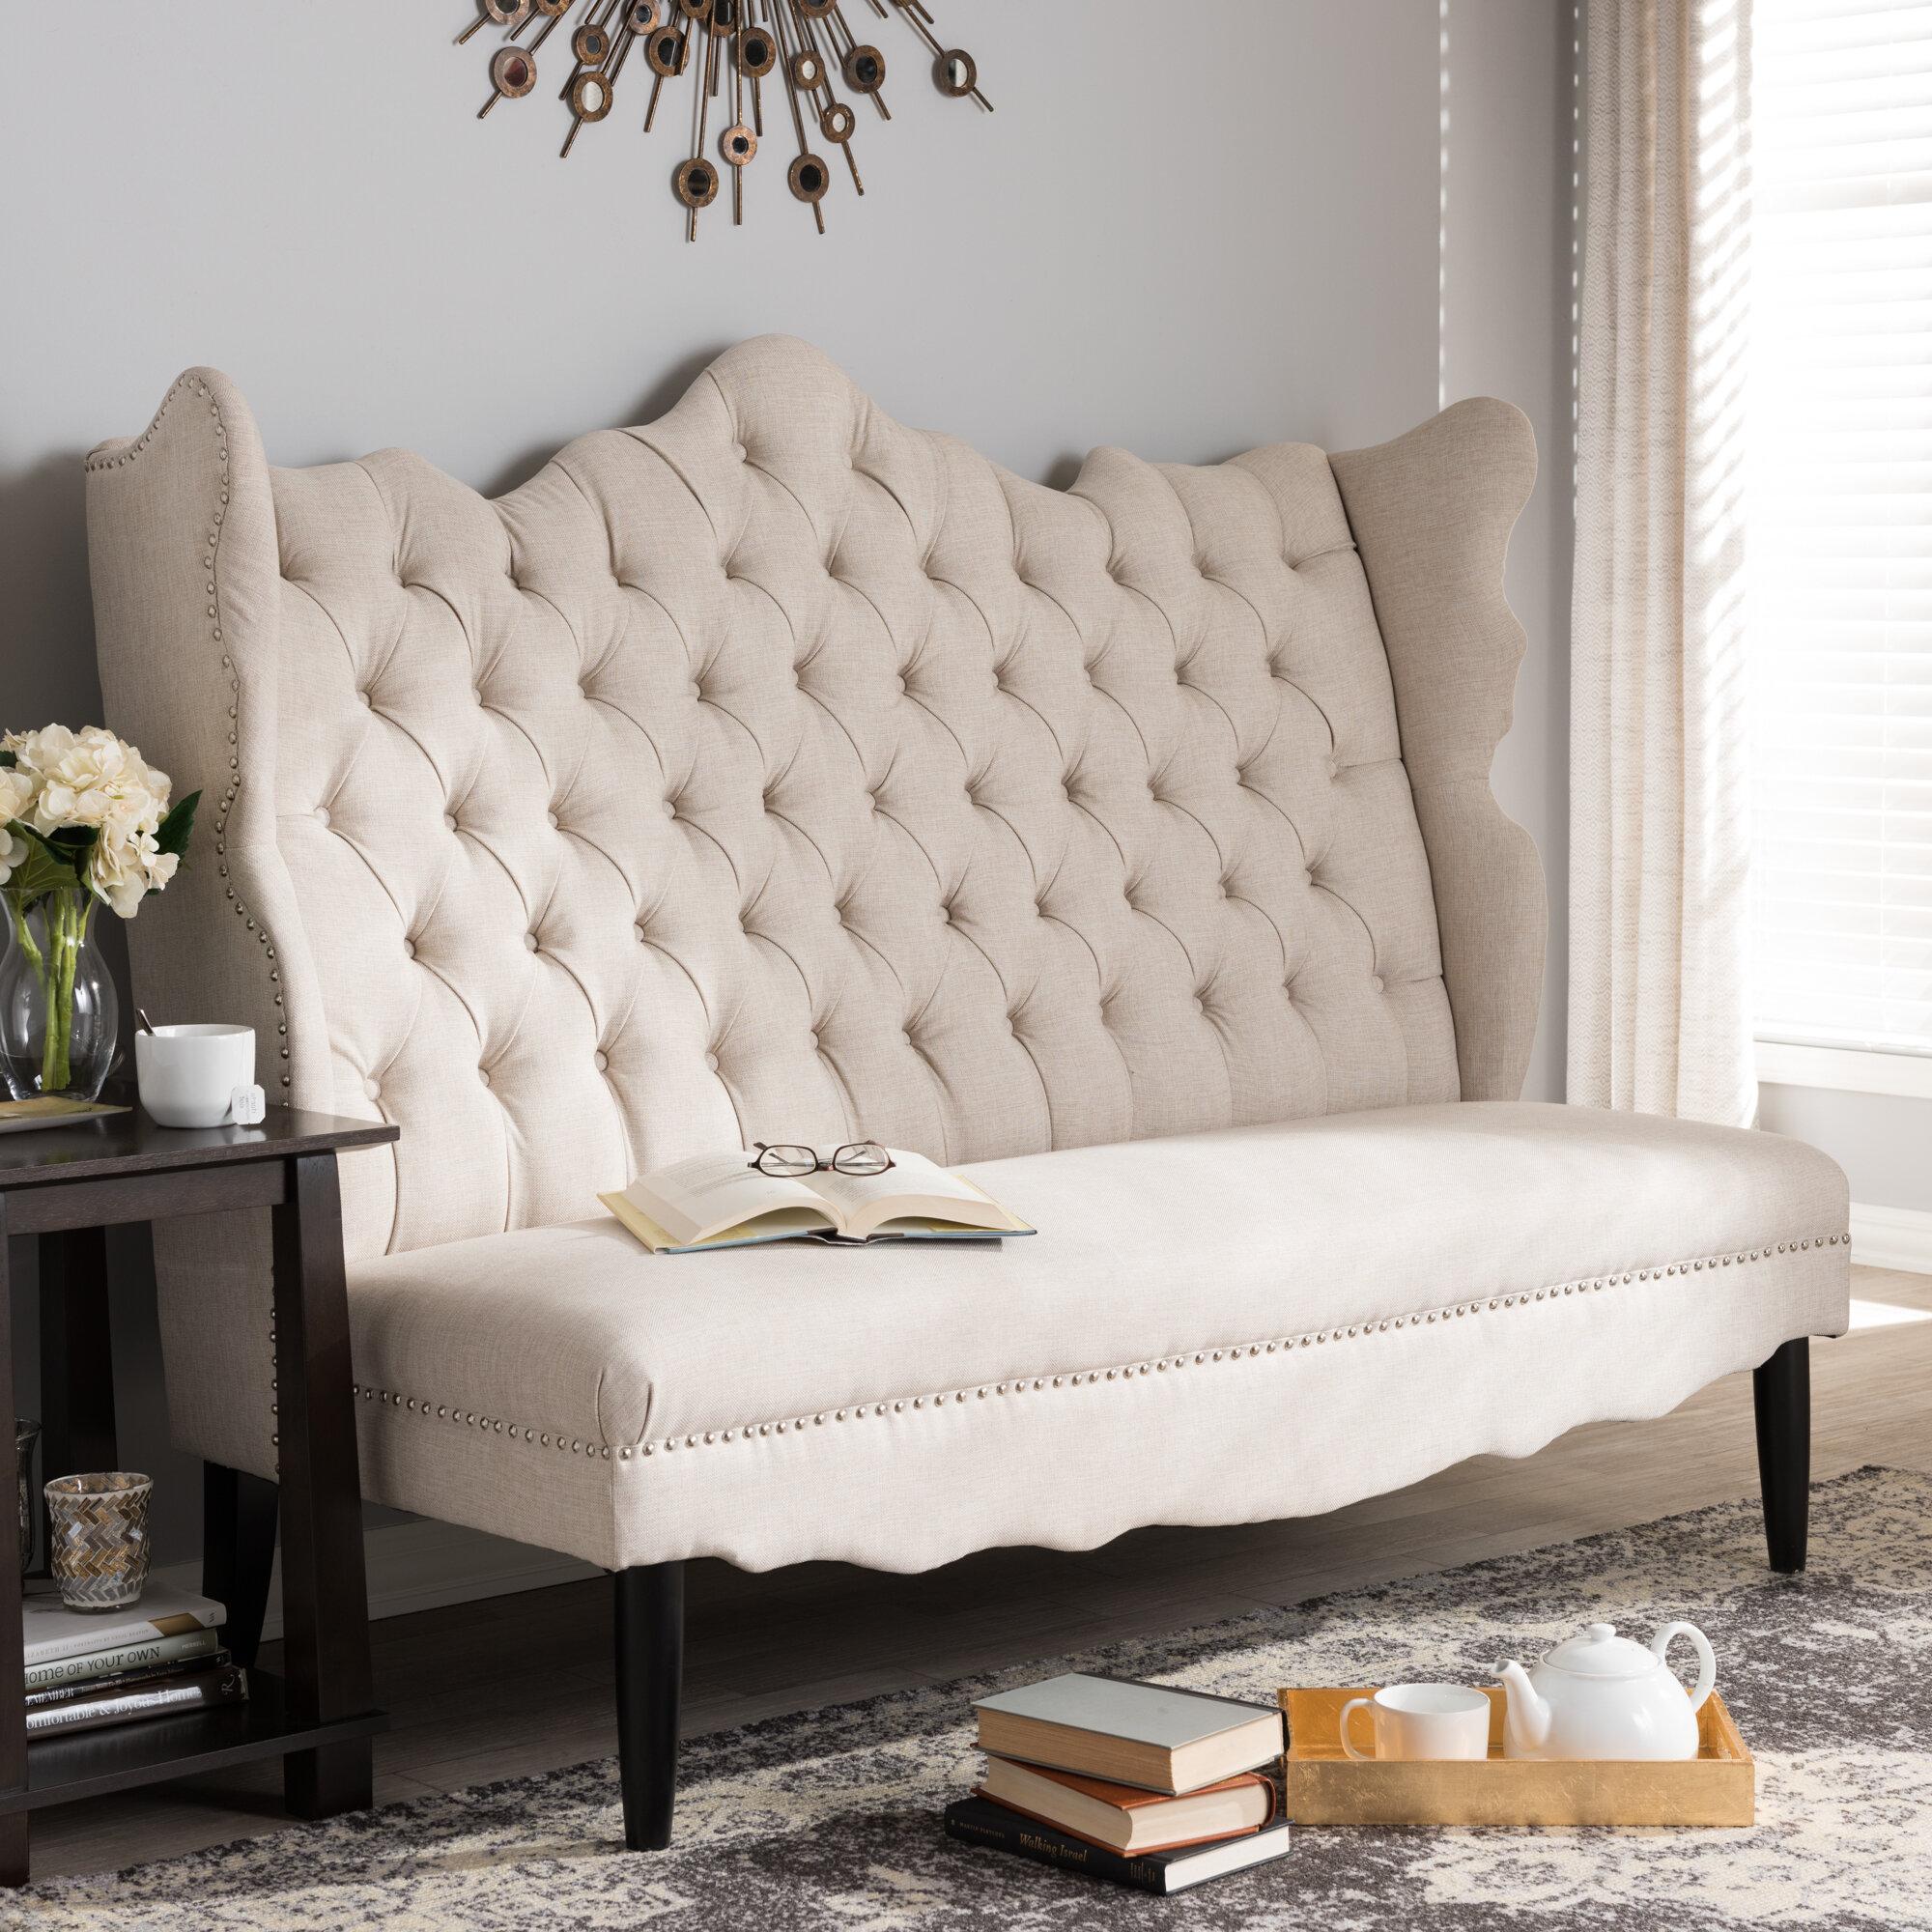 tufted main high halpin settee back joss pdp furniture bench